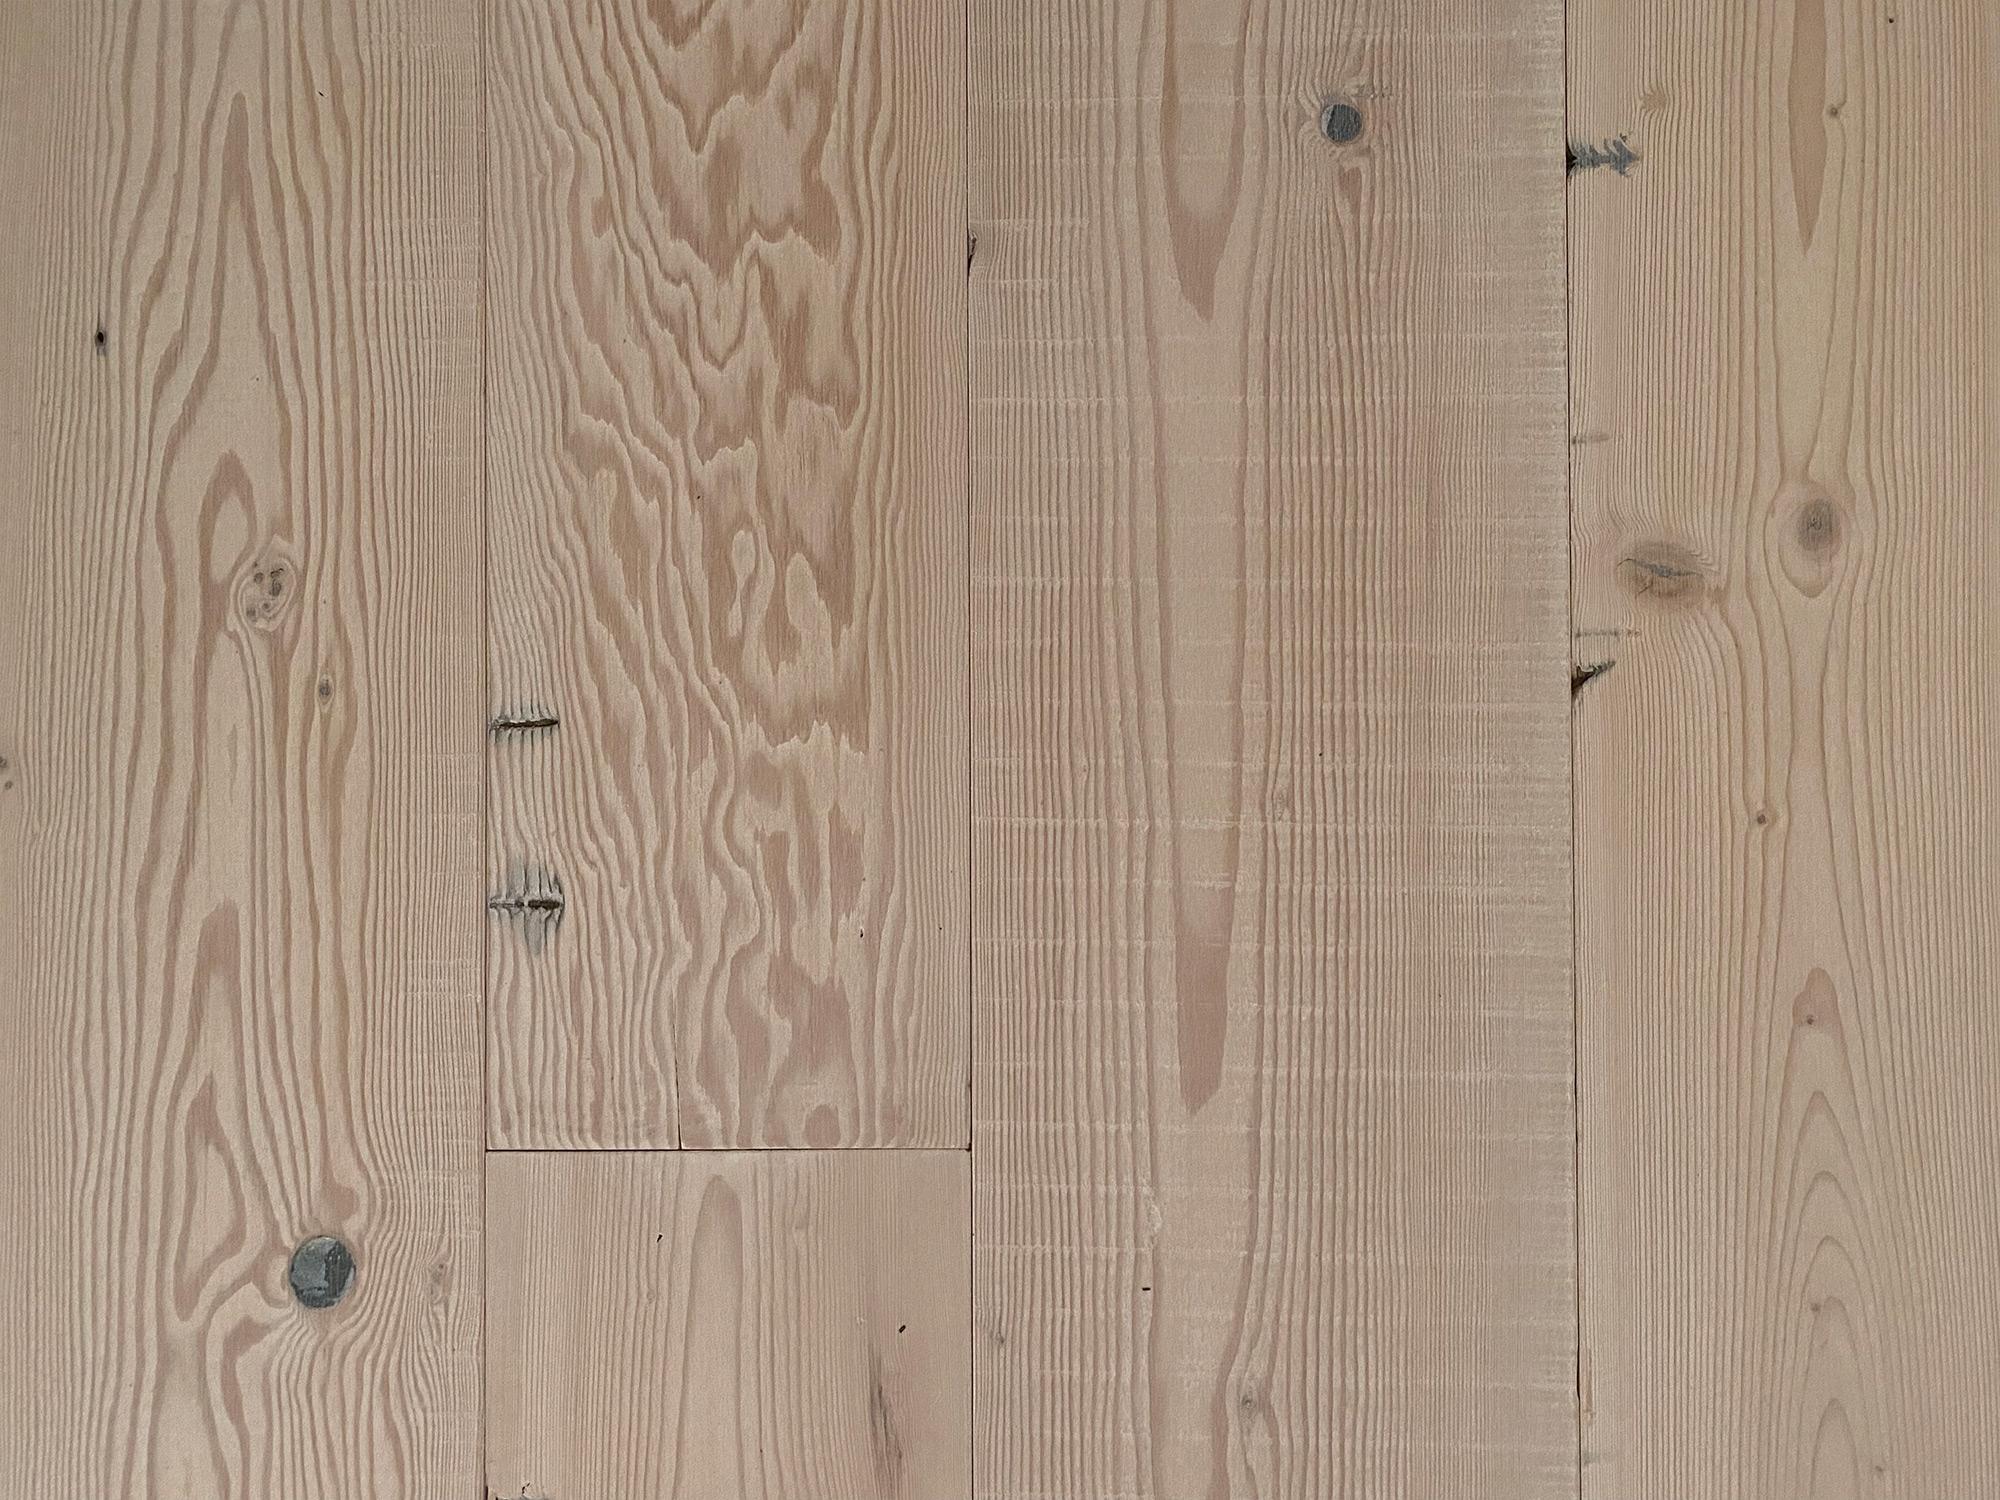 Whitewash reclaimed pine flooring